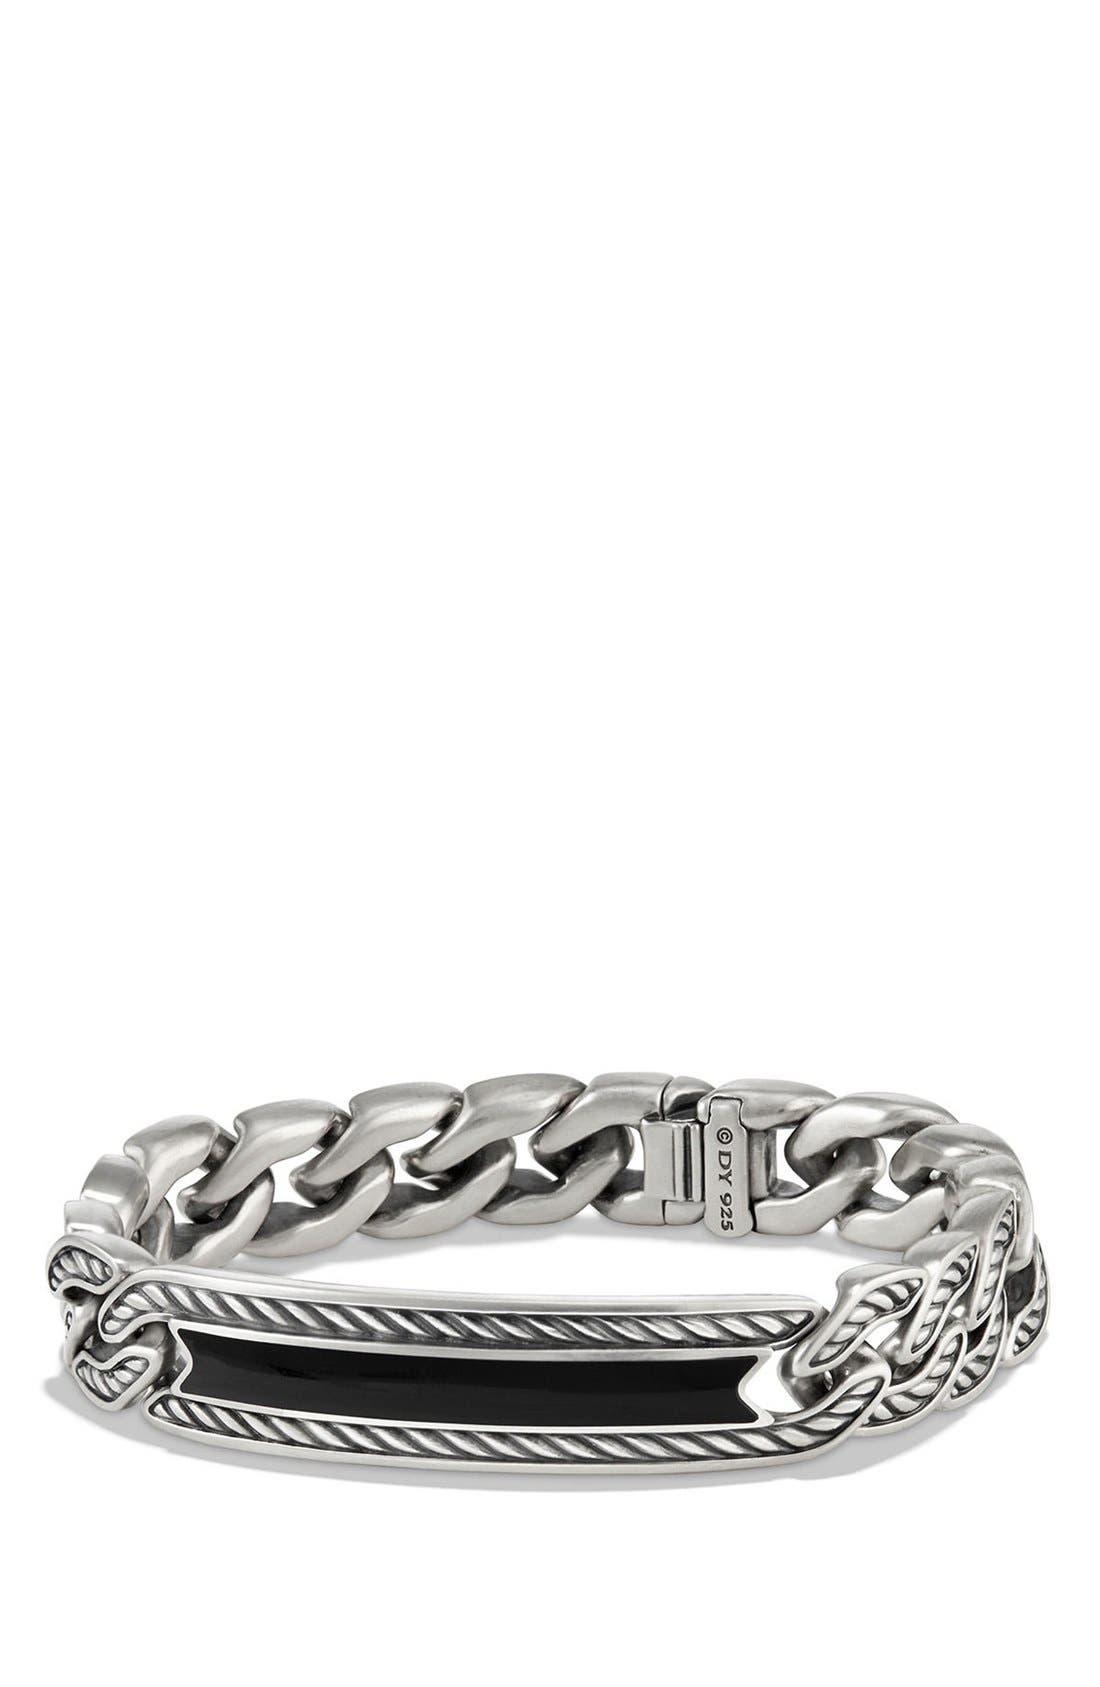 'Maritime' Curb Link ID Bracelet,                         Main,                         color, SILVER/ BLACK ONYX